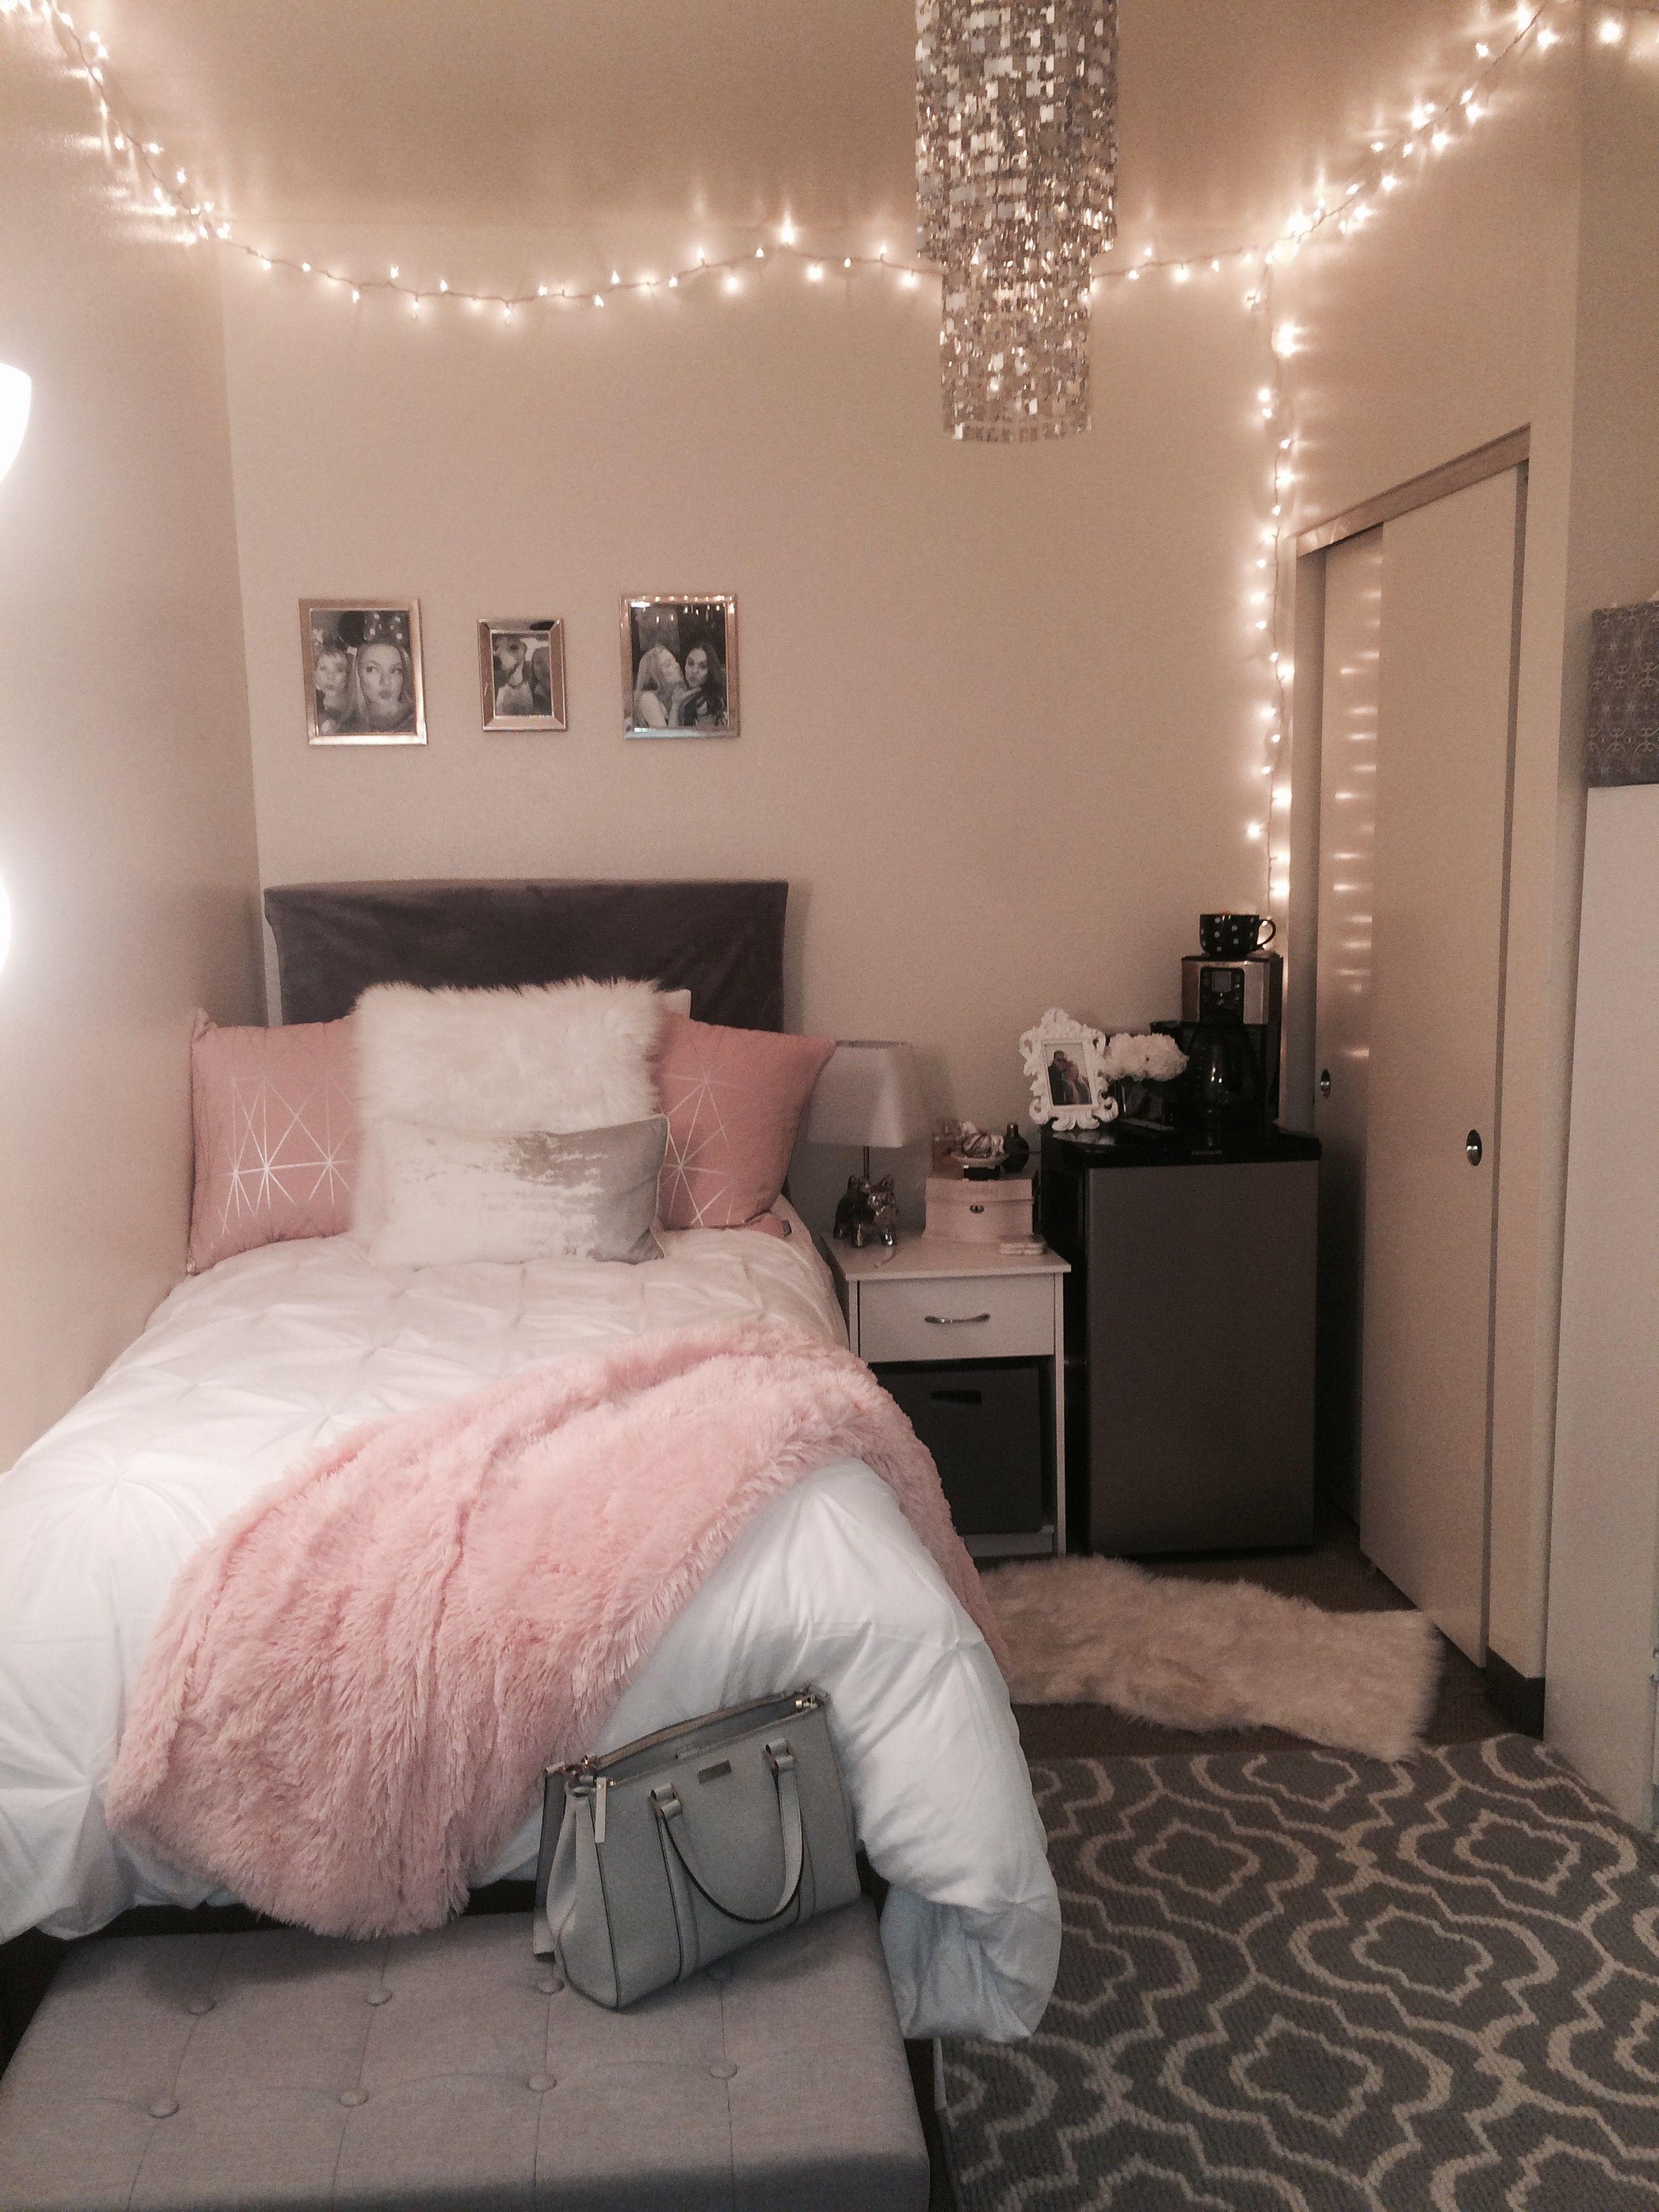 Sonoma State Dorm Rooms Beaujolais Village Sopre Room Pink And Silver Diydormroom